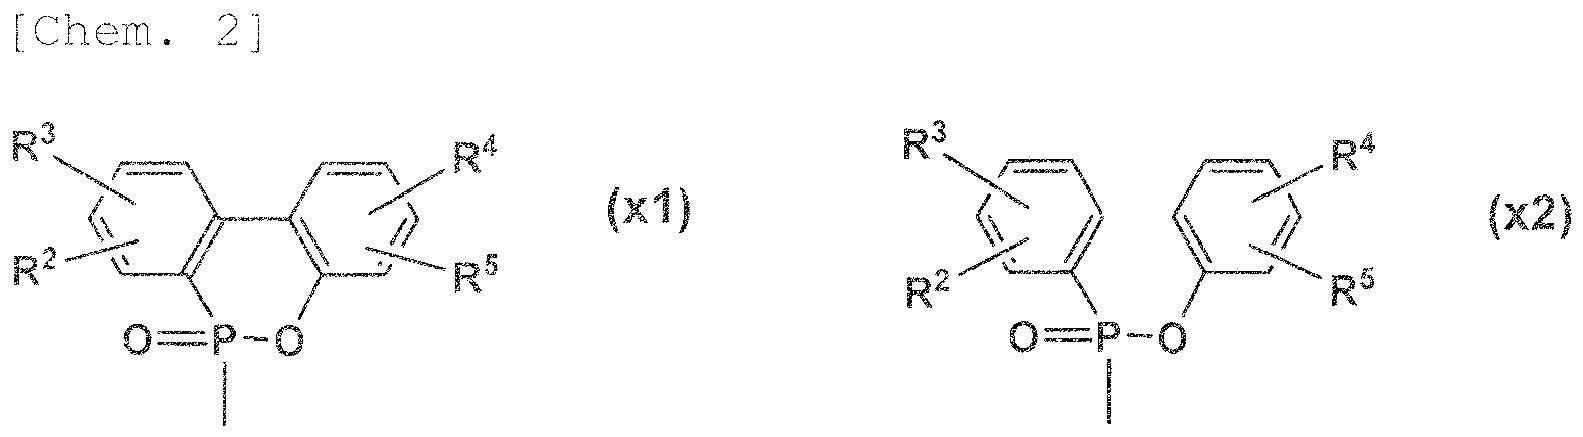 Ep2537853a1 Phosphorus Atom Containing Oligomers Process For